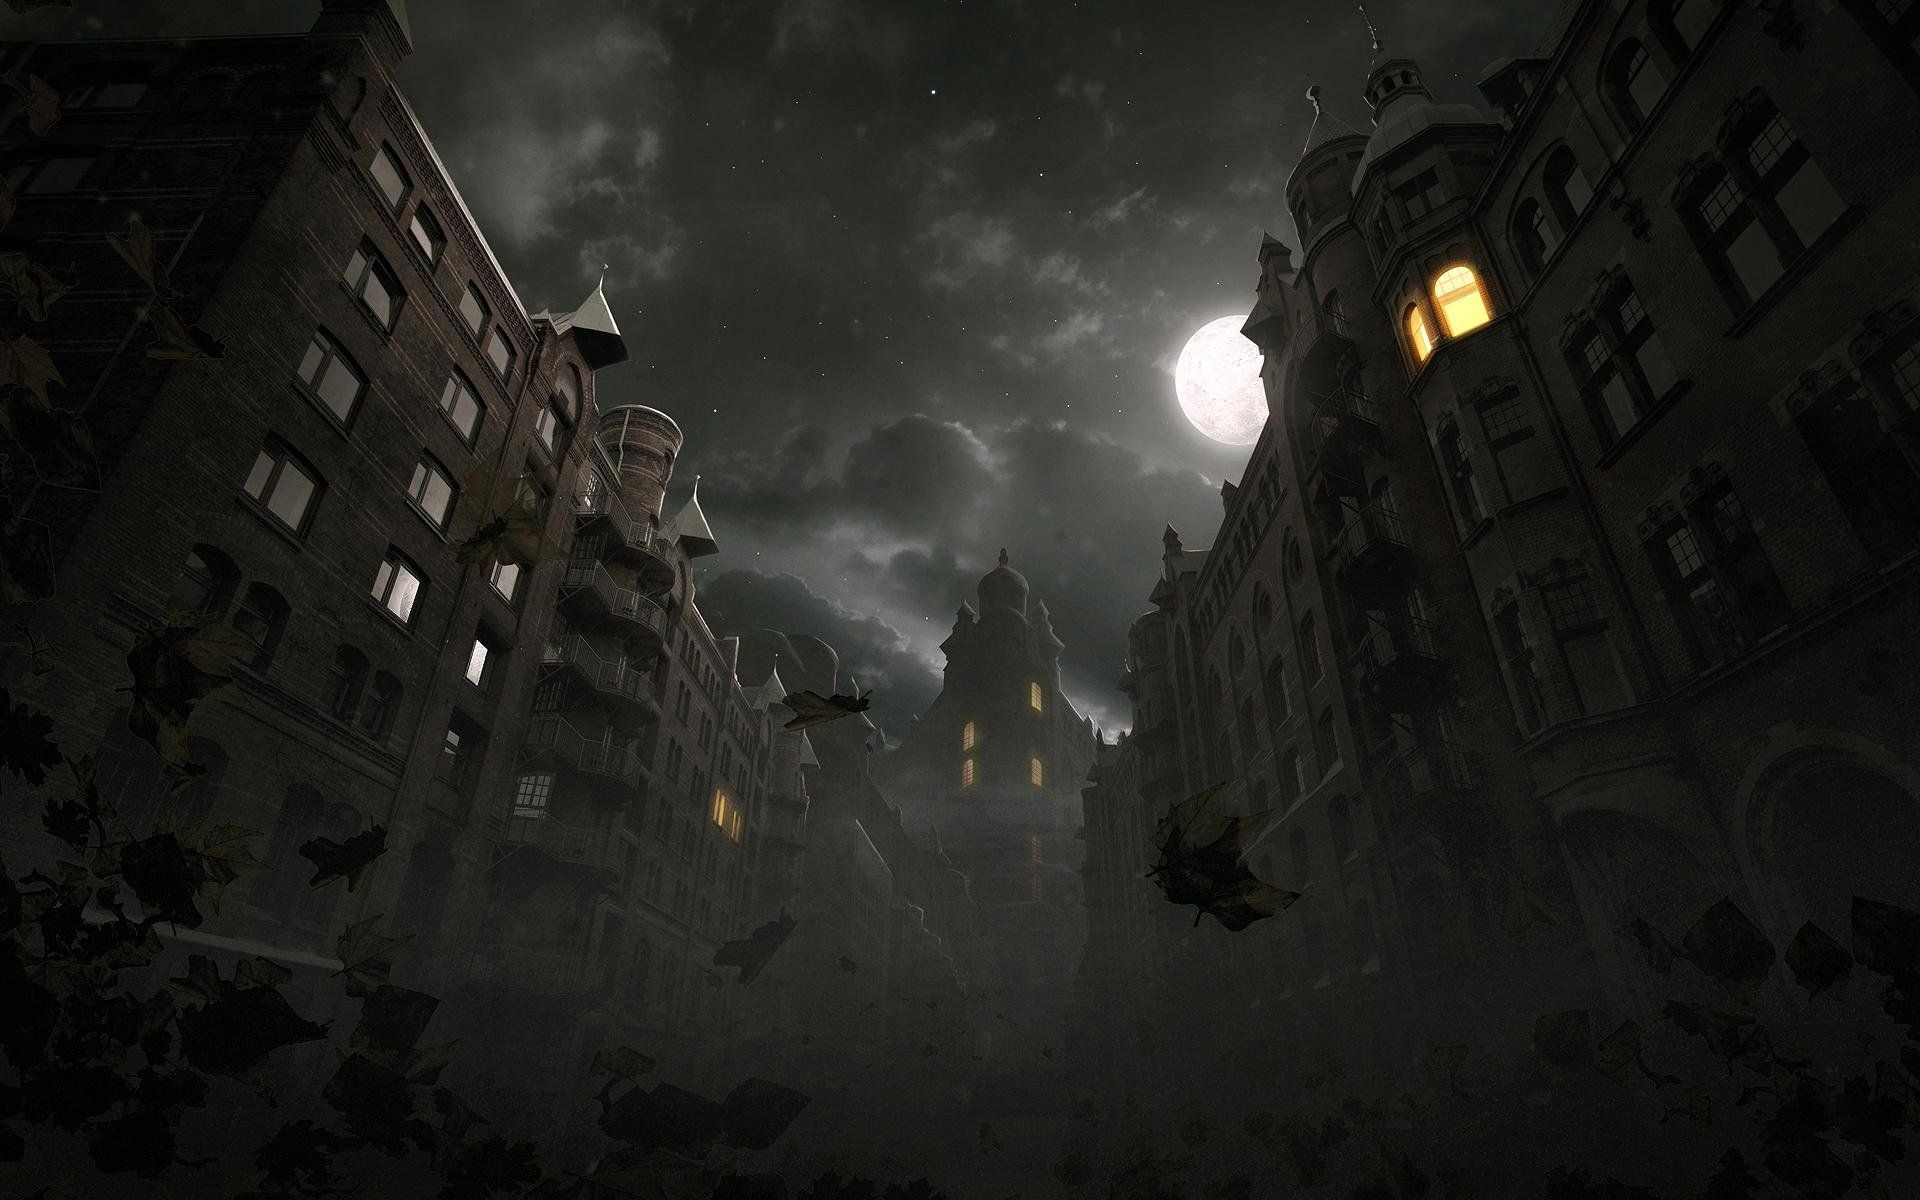 Best Wallpaper Night Ghost - a83864368c30ac527576c751d51cd76d  Graphic-72855.jpg